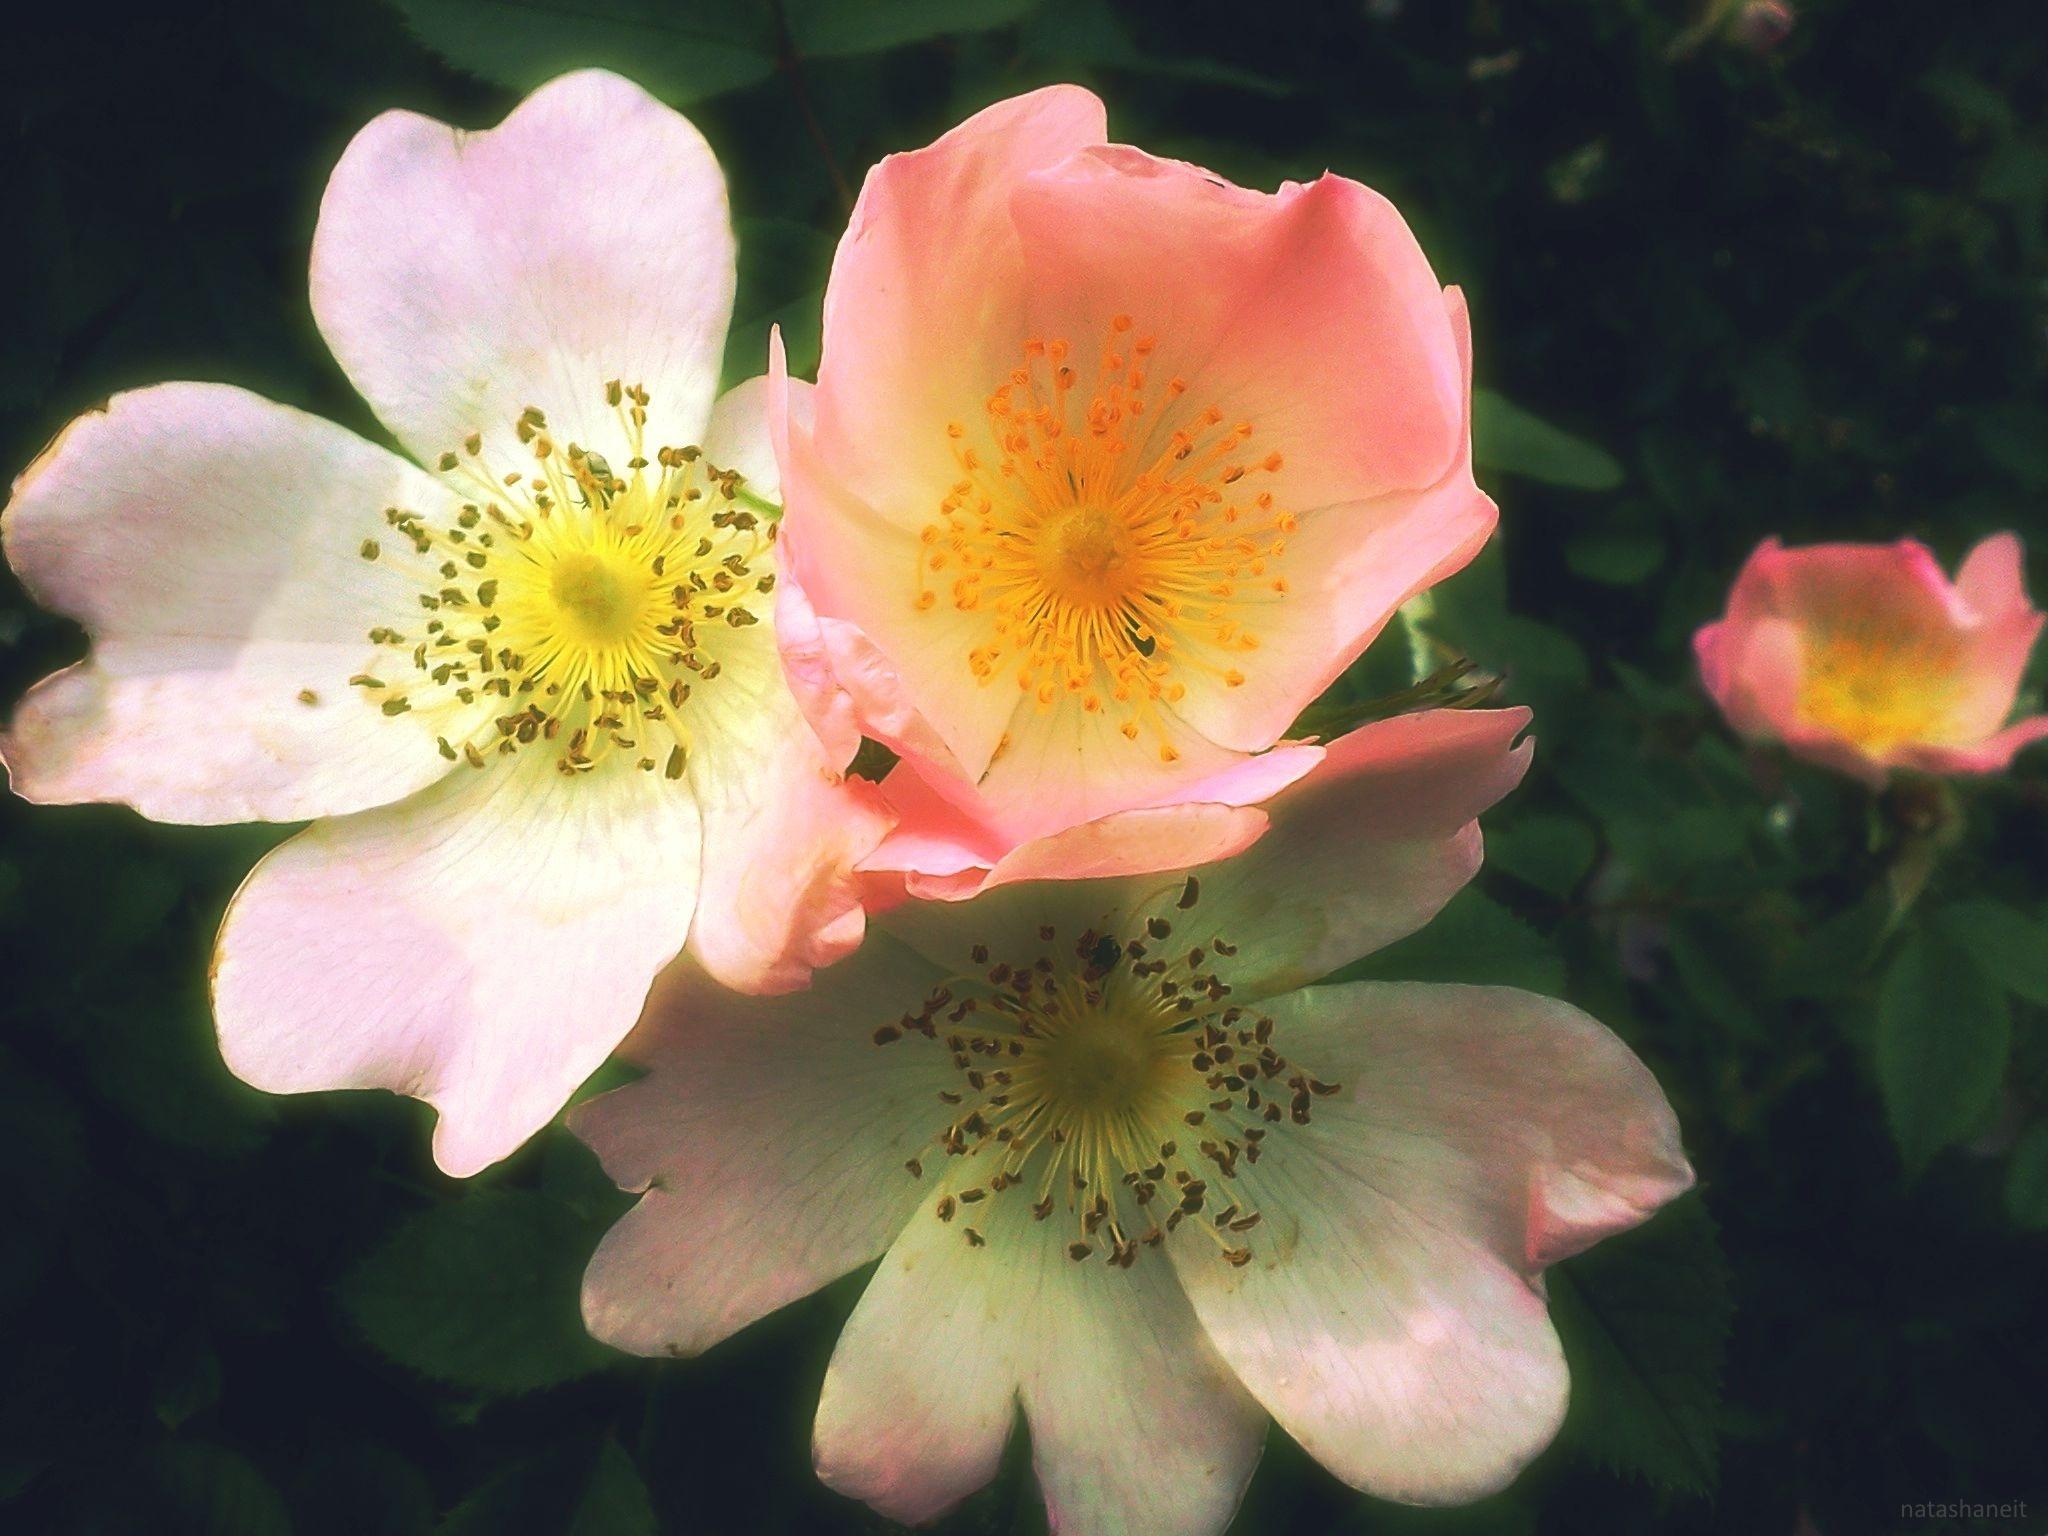 Pink flowers of wild rose by natashaneit